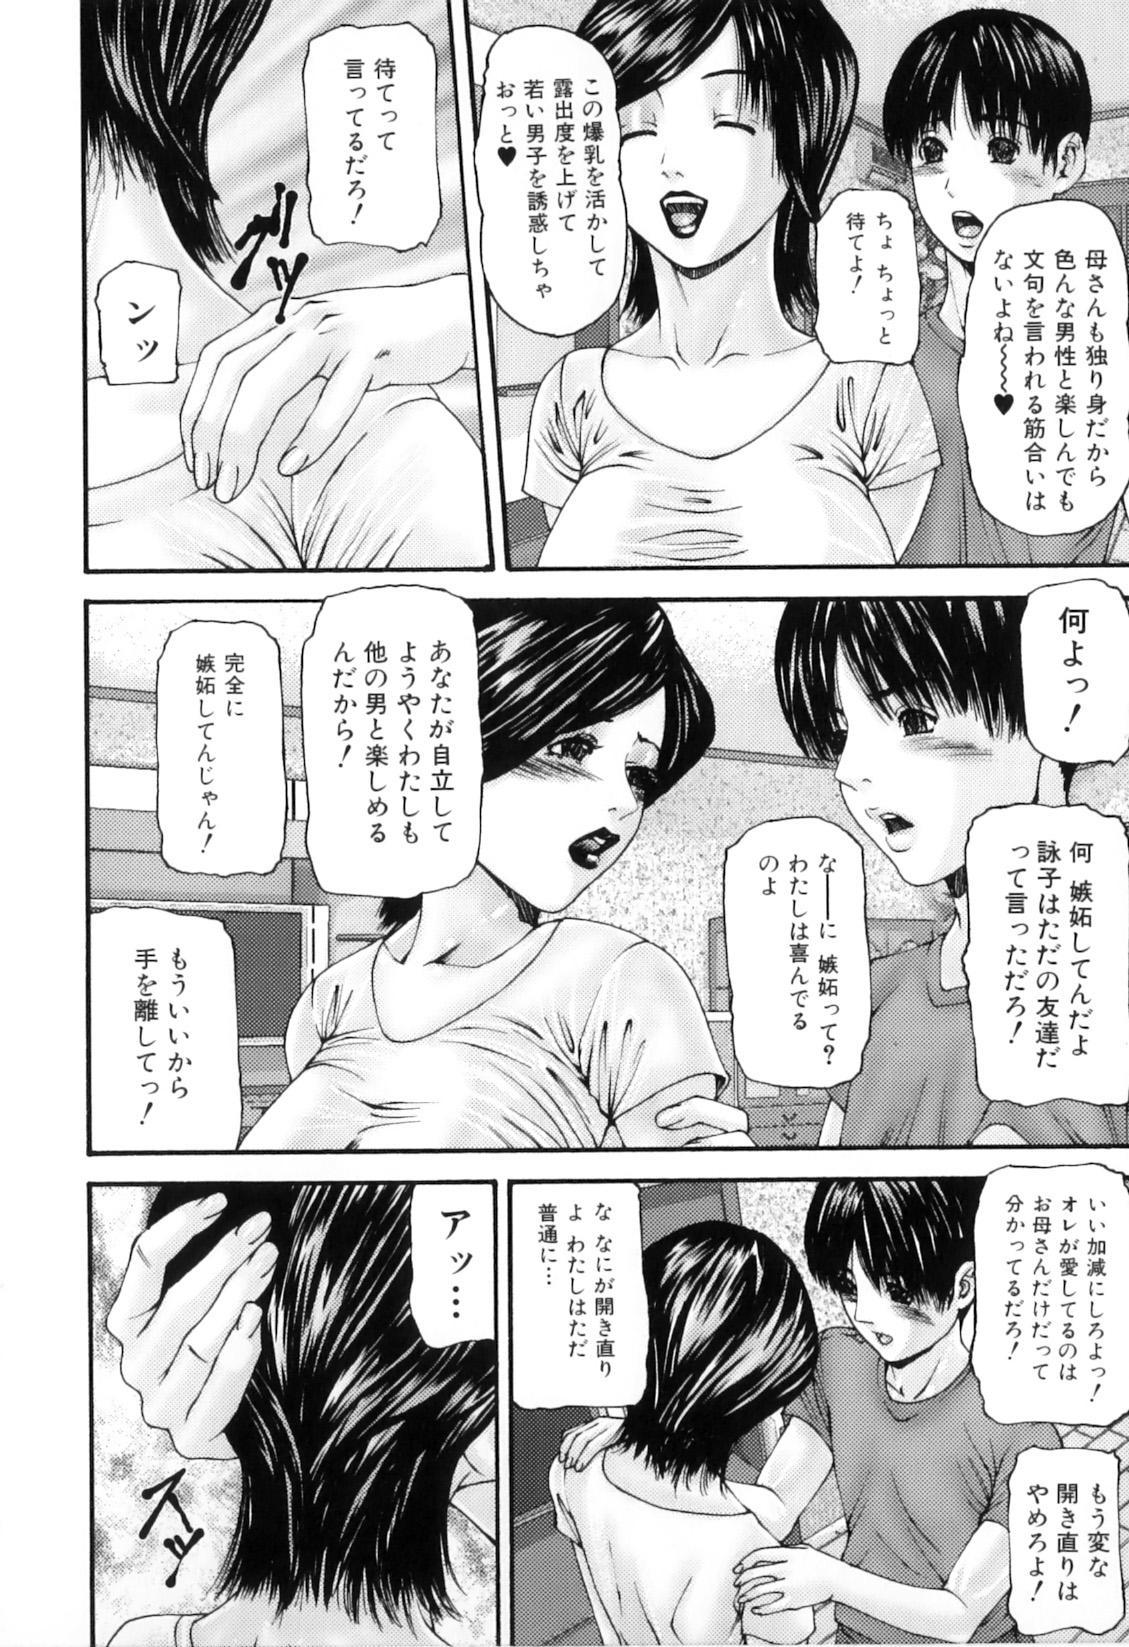 Boshi Chijou Kitan 107